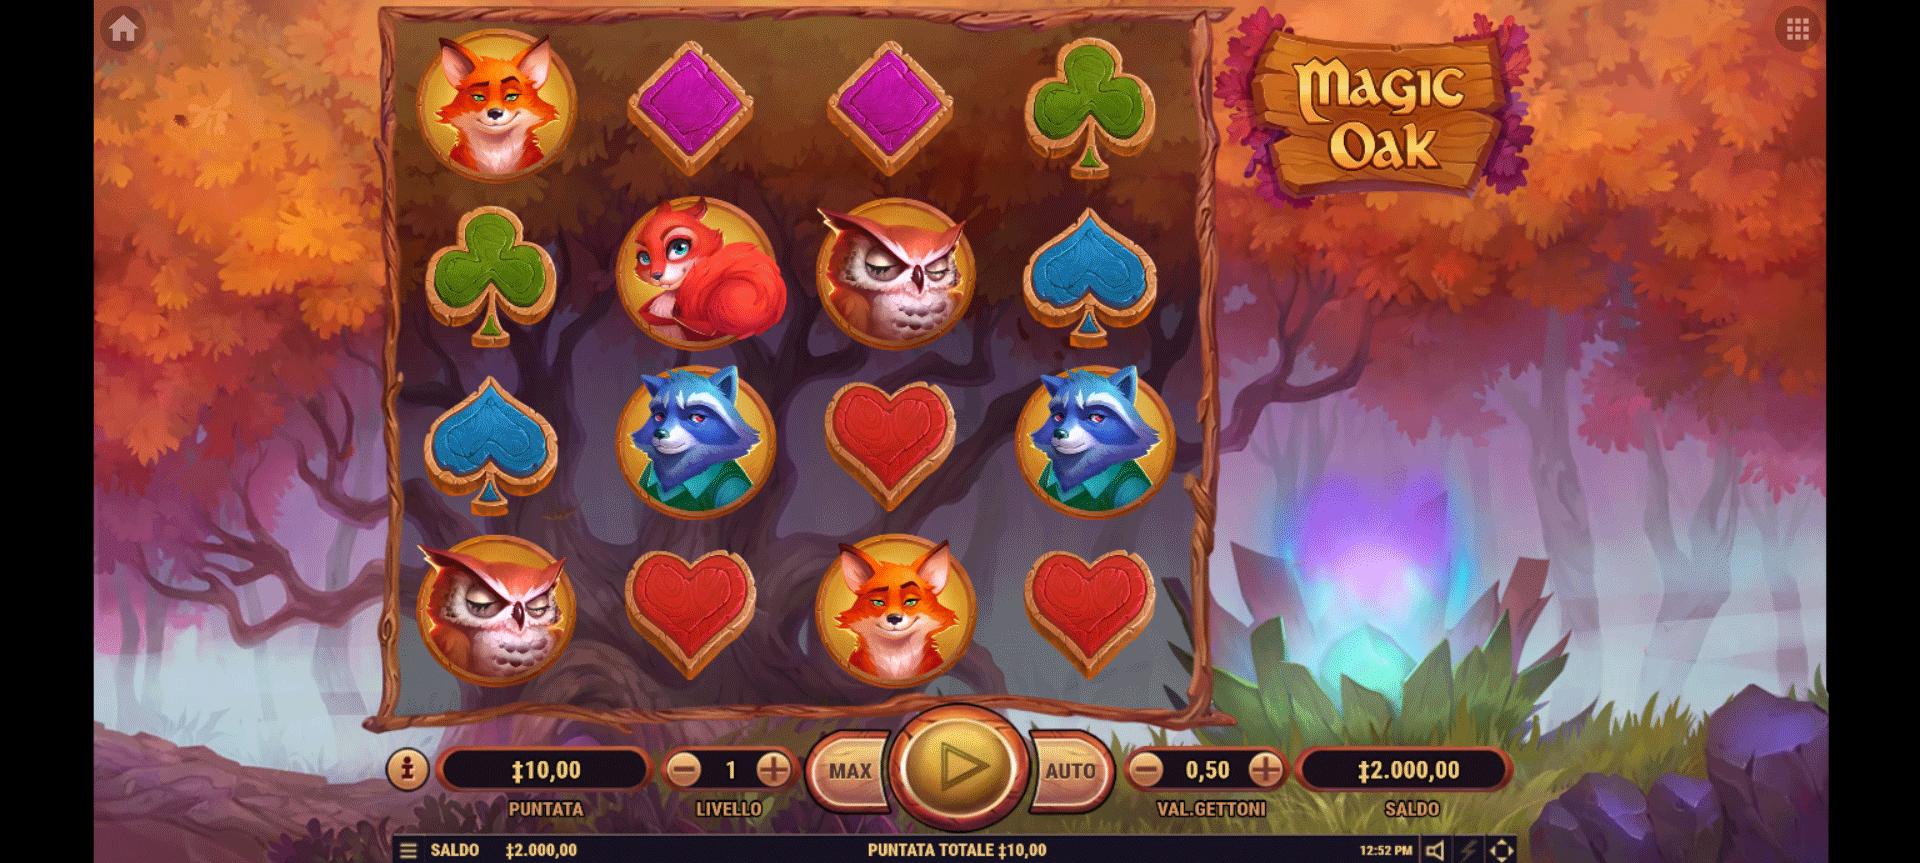 Slot Magic Oak